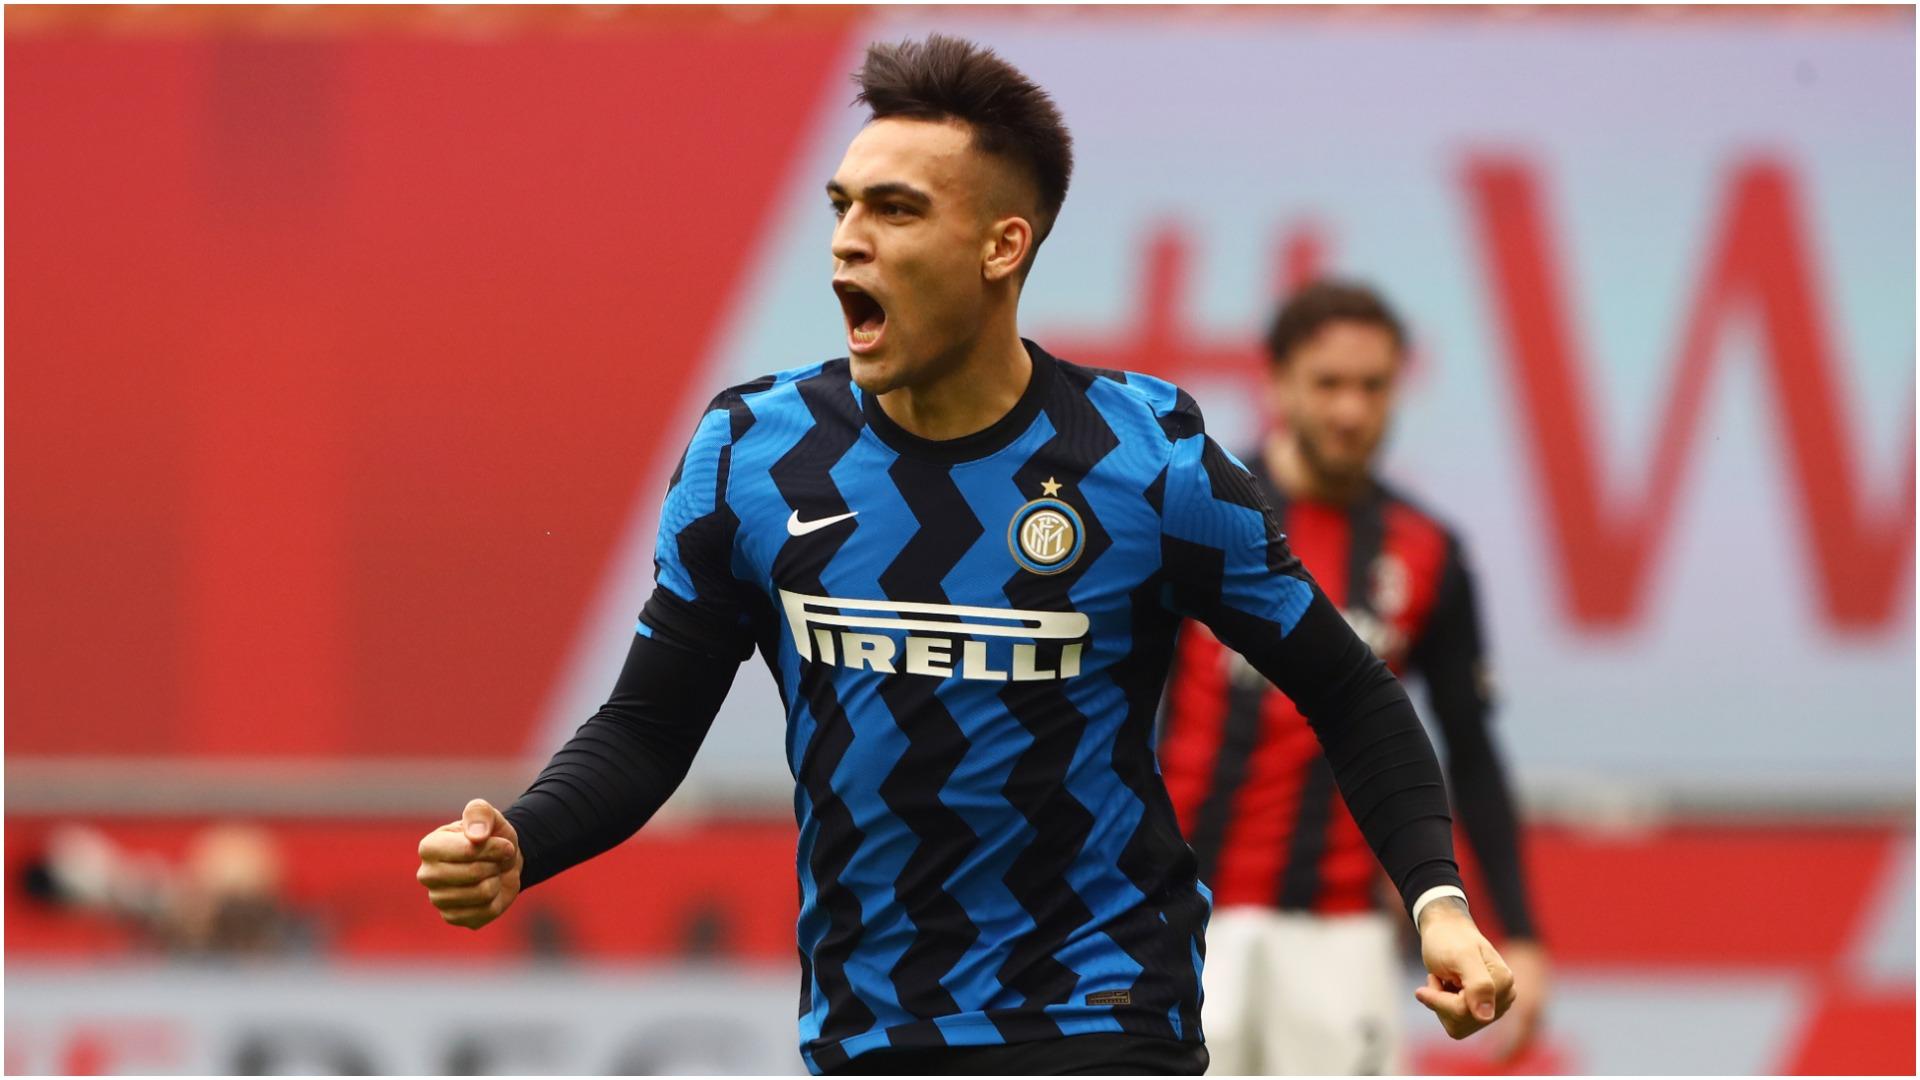 Milan 0-3 Inter: Martinez and Lukaku help Nerazzurri seize control in title race